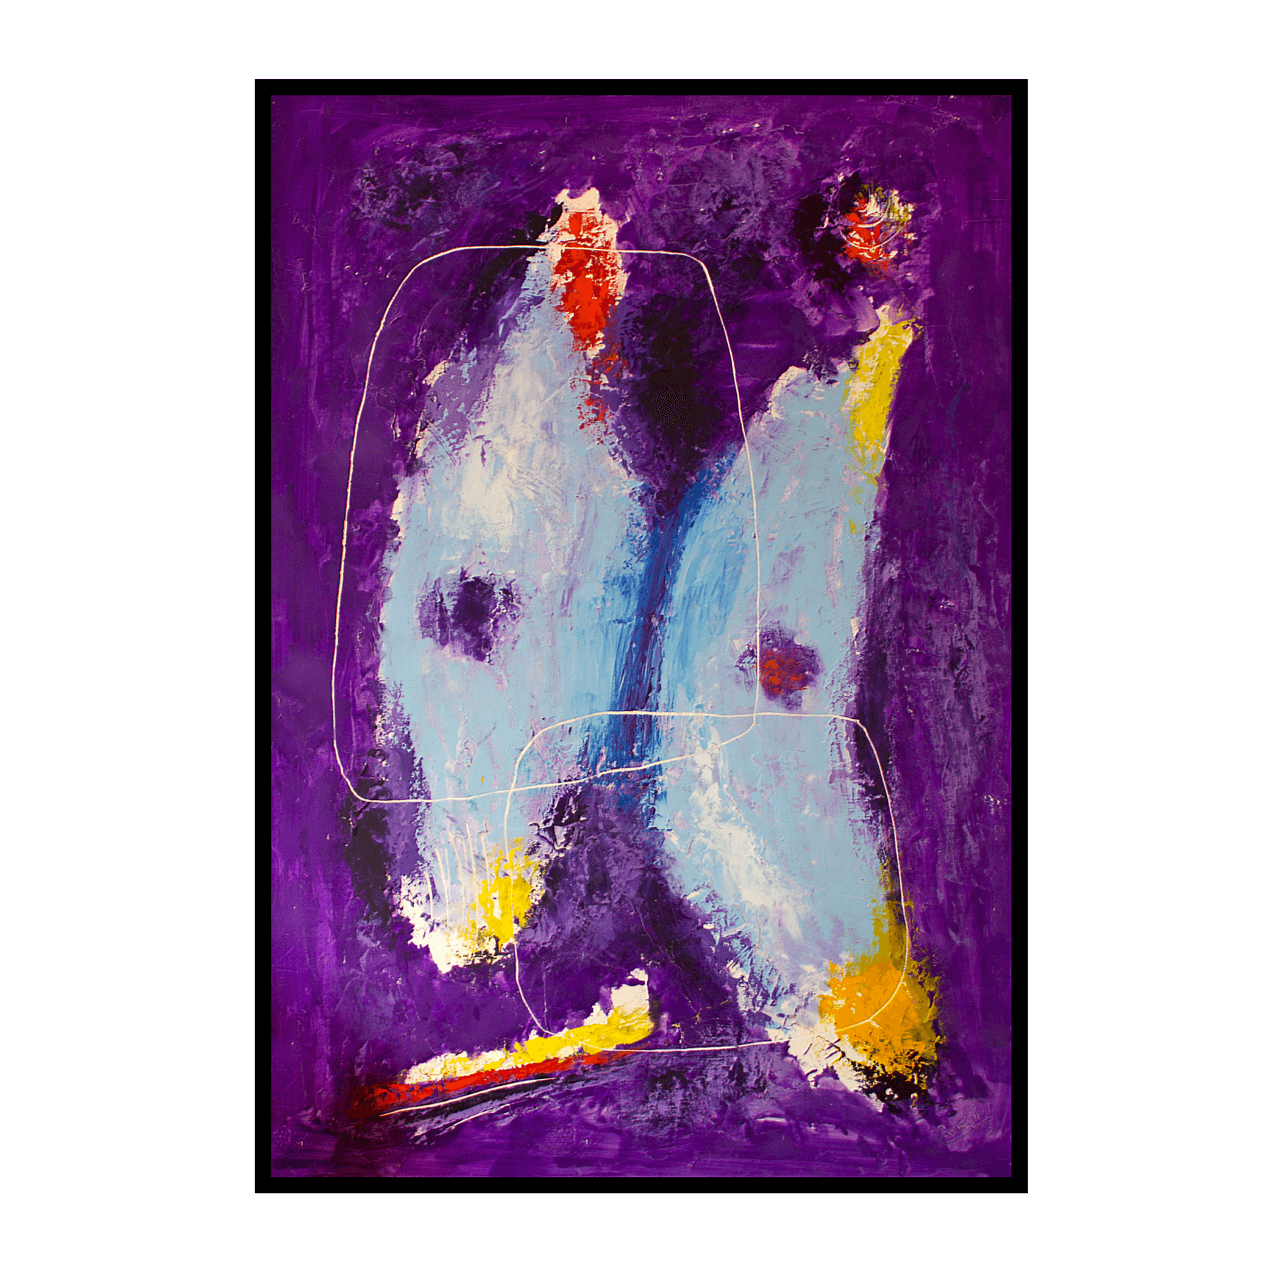 quadro dipinto olio Mario Pavesi pittura artista reggiano catene farfalle